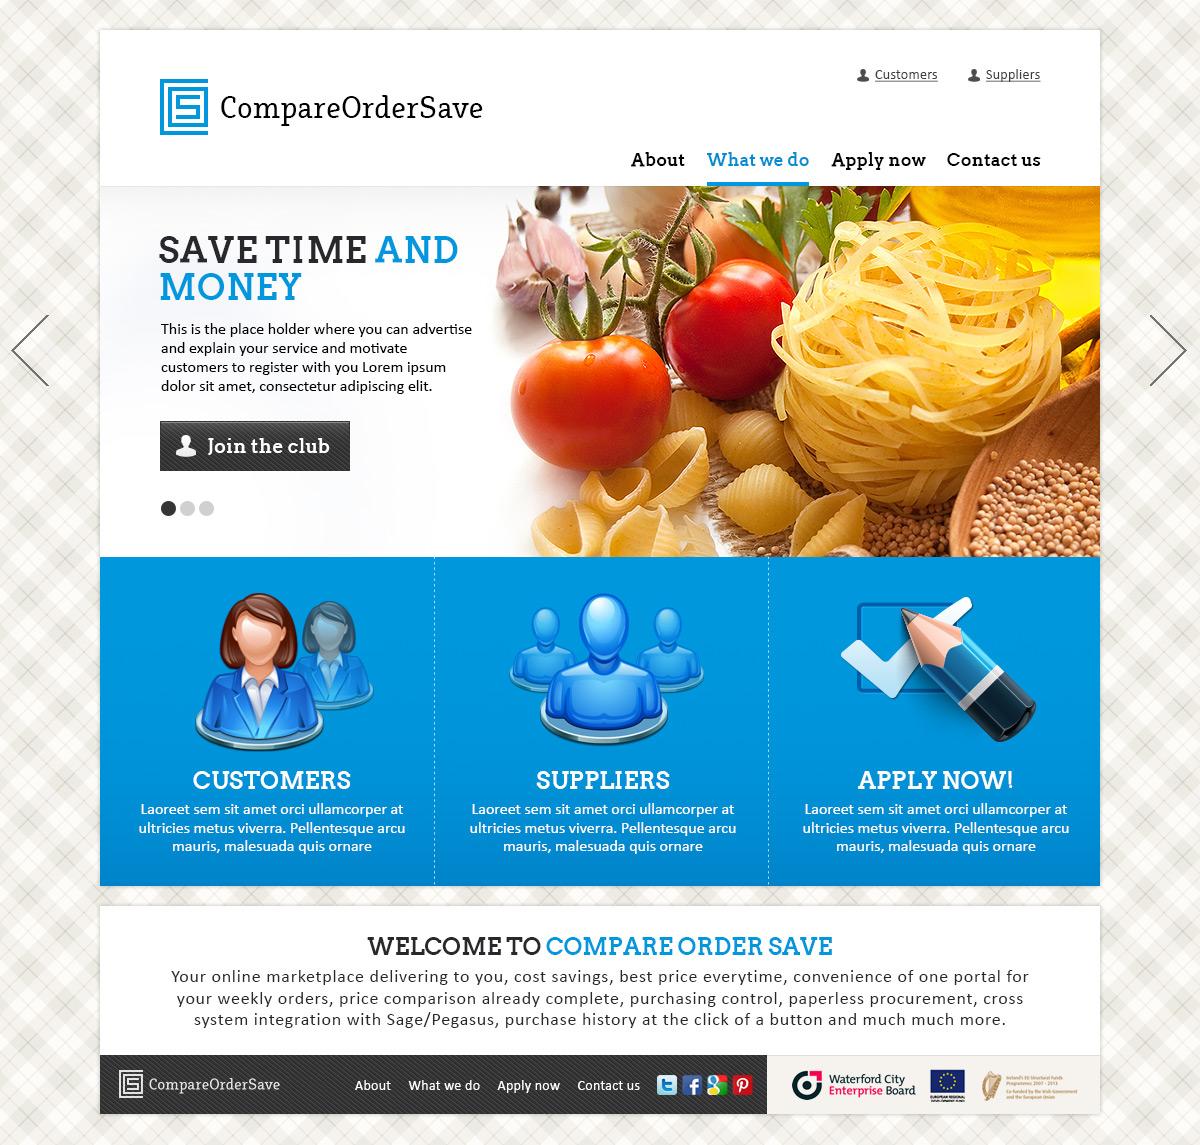 Верстка сайта CompareOrderSave